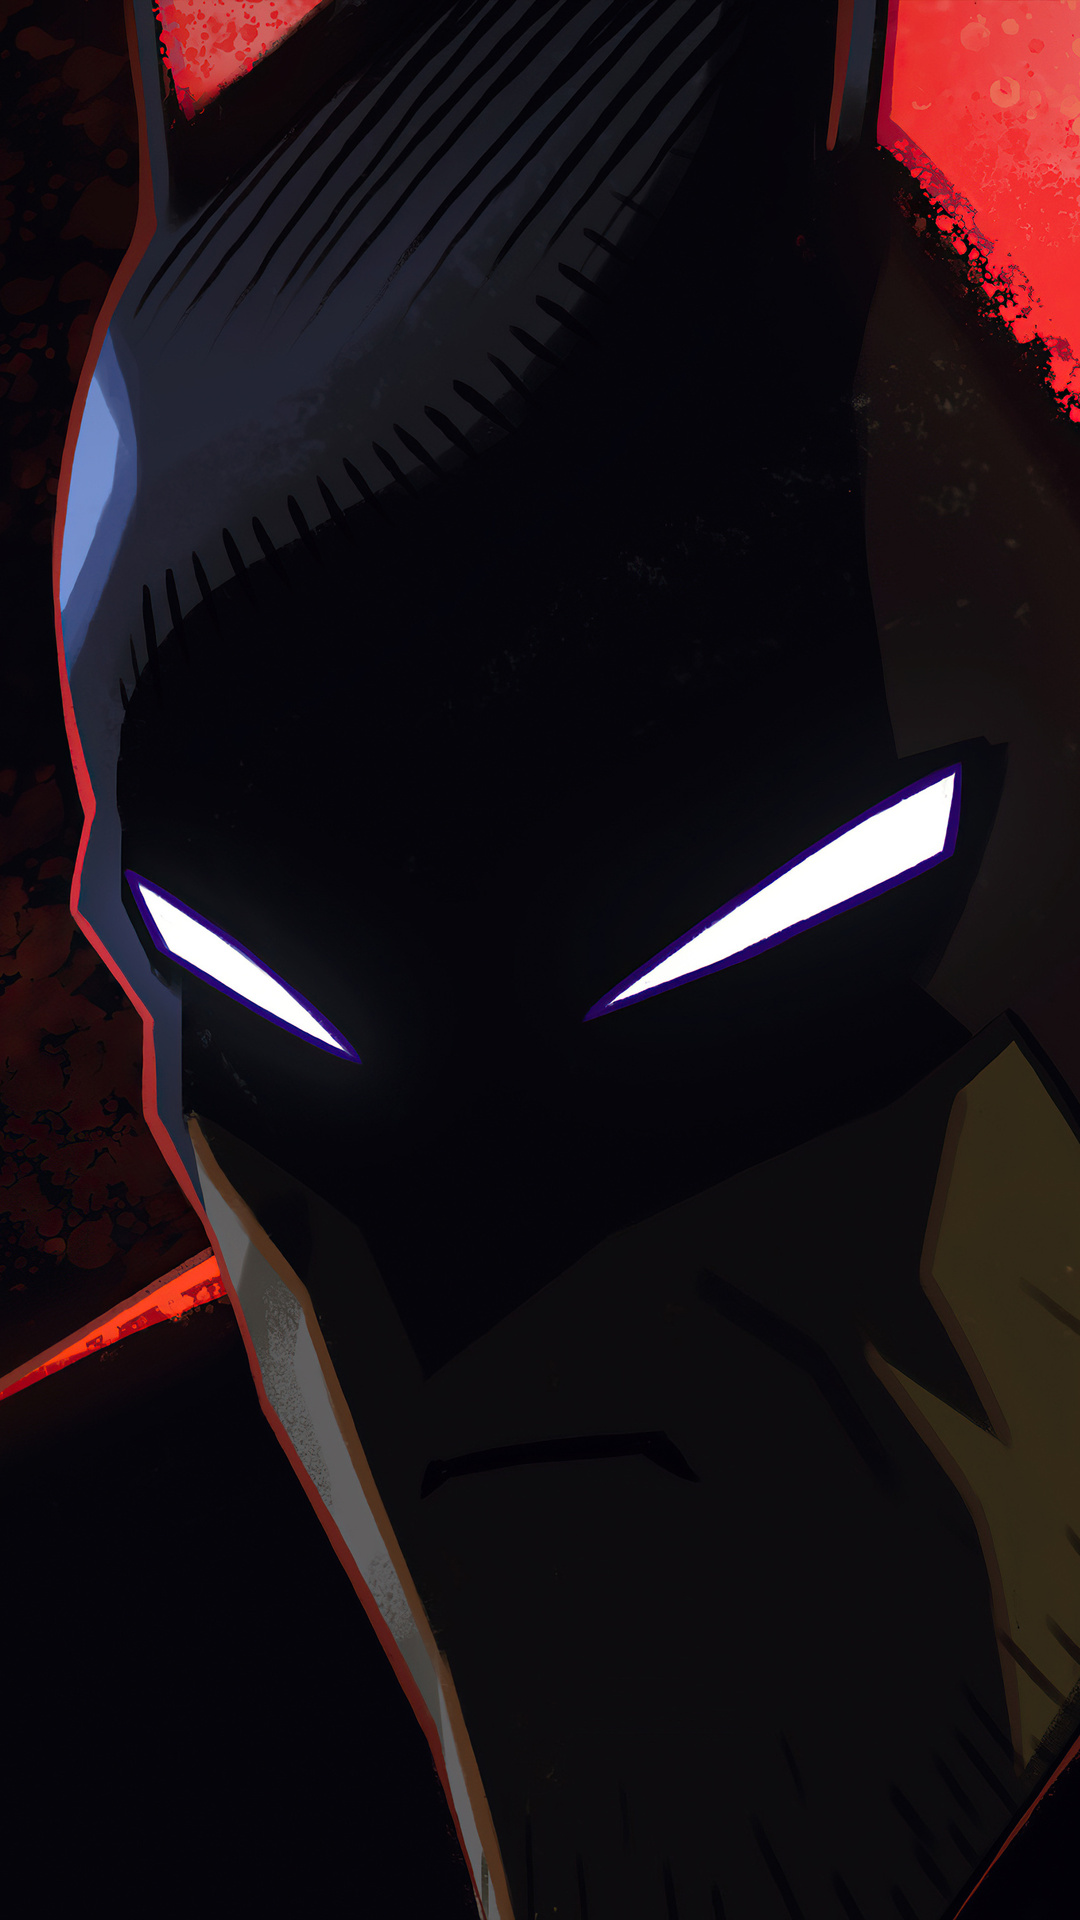 batman-animated-series-opening-from-1992-y3.jpg